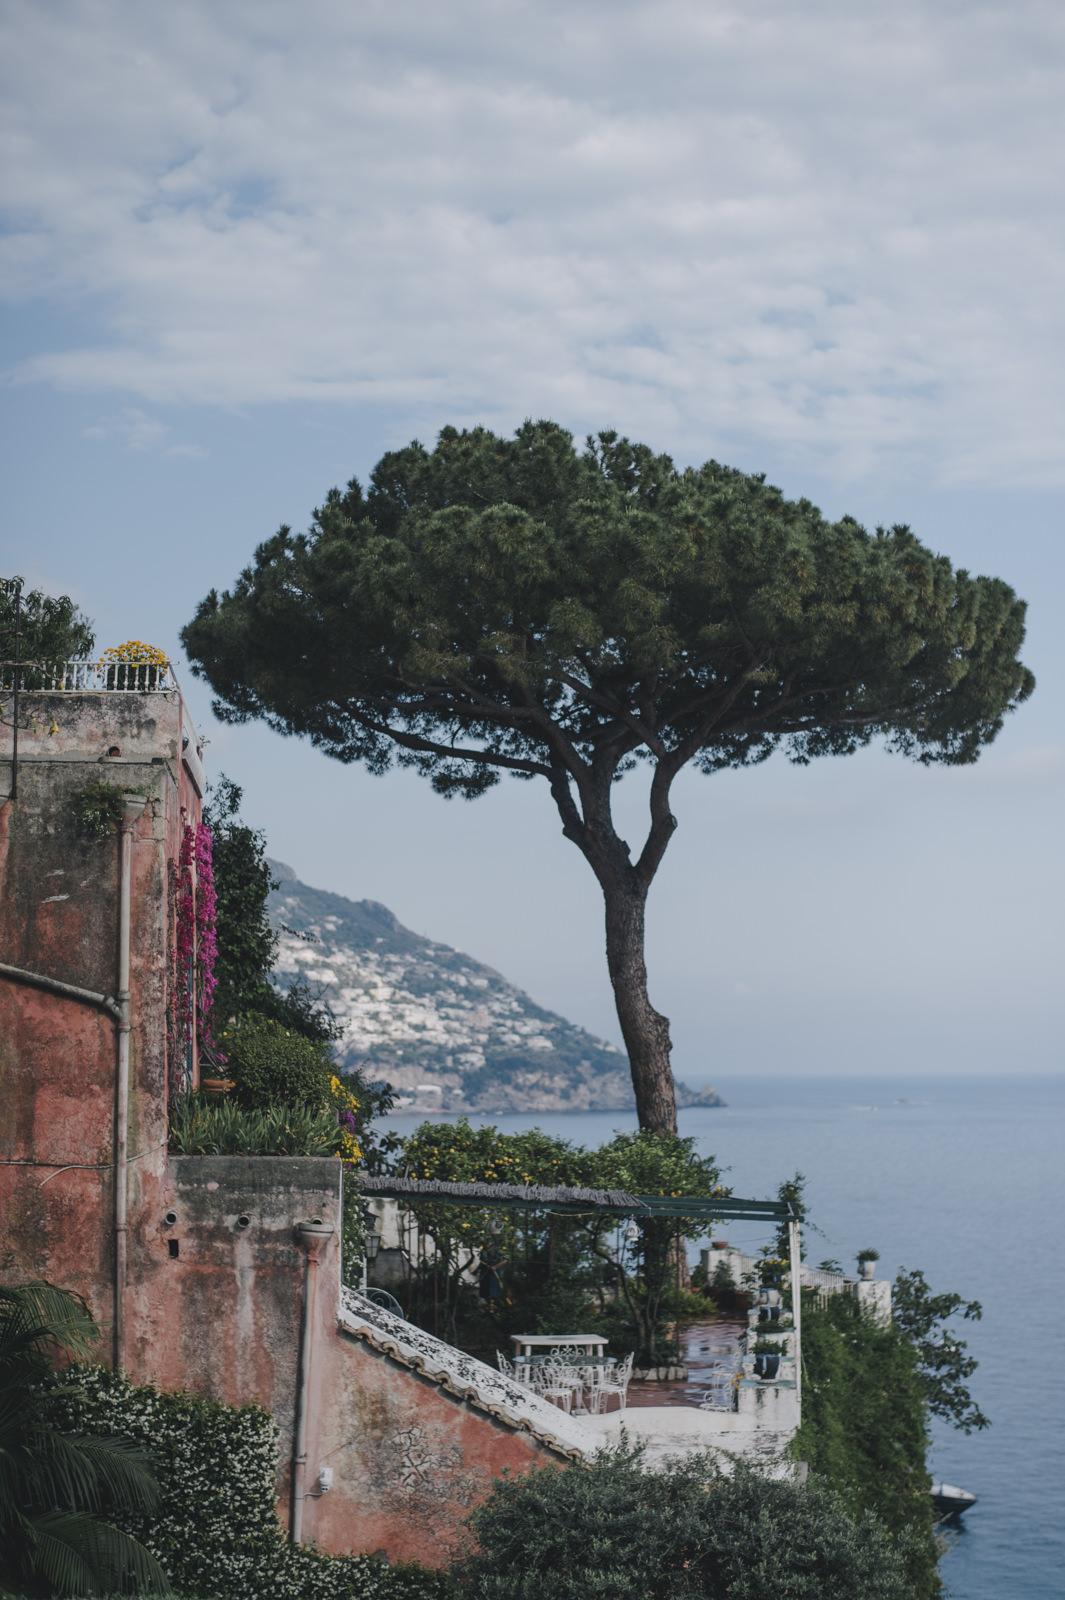 landscape from hotel Marincanto in Positano